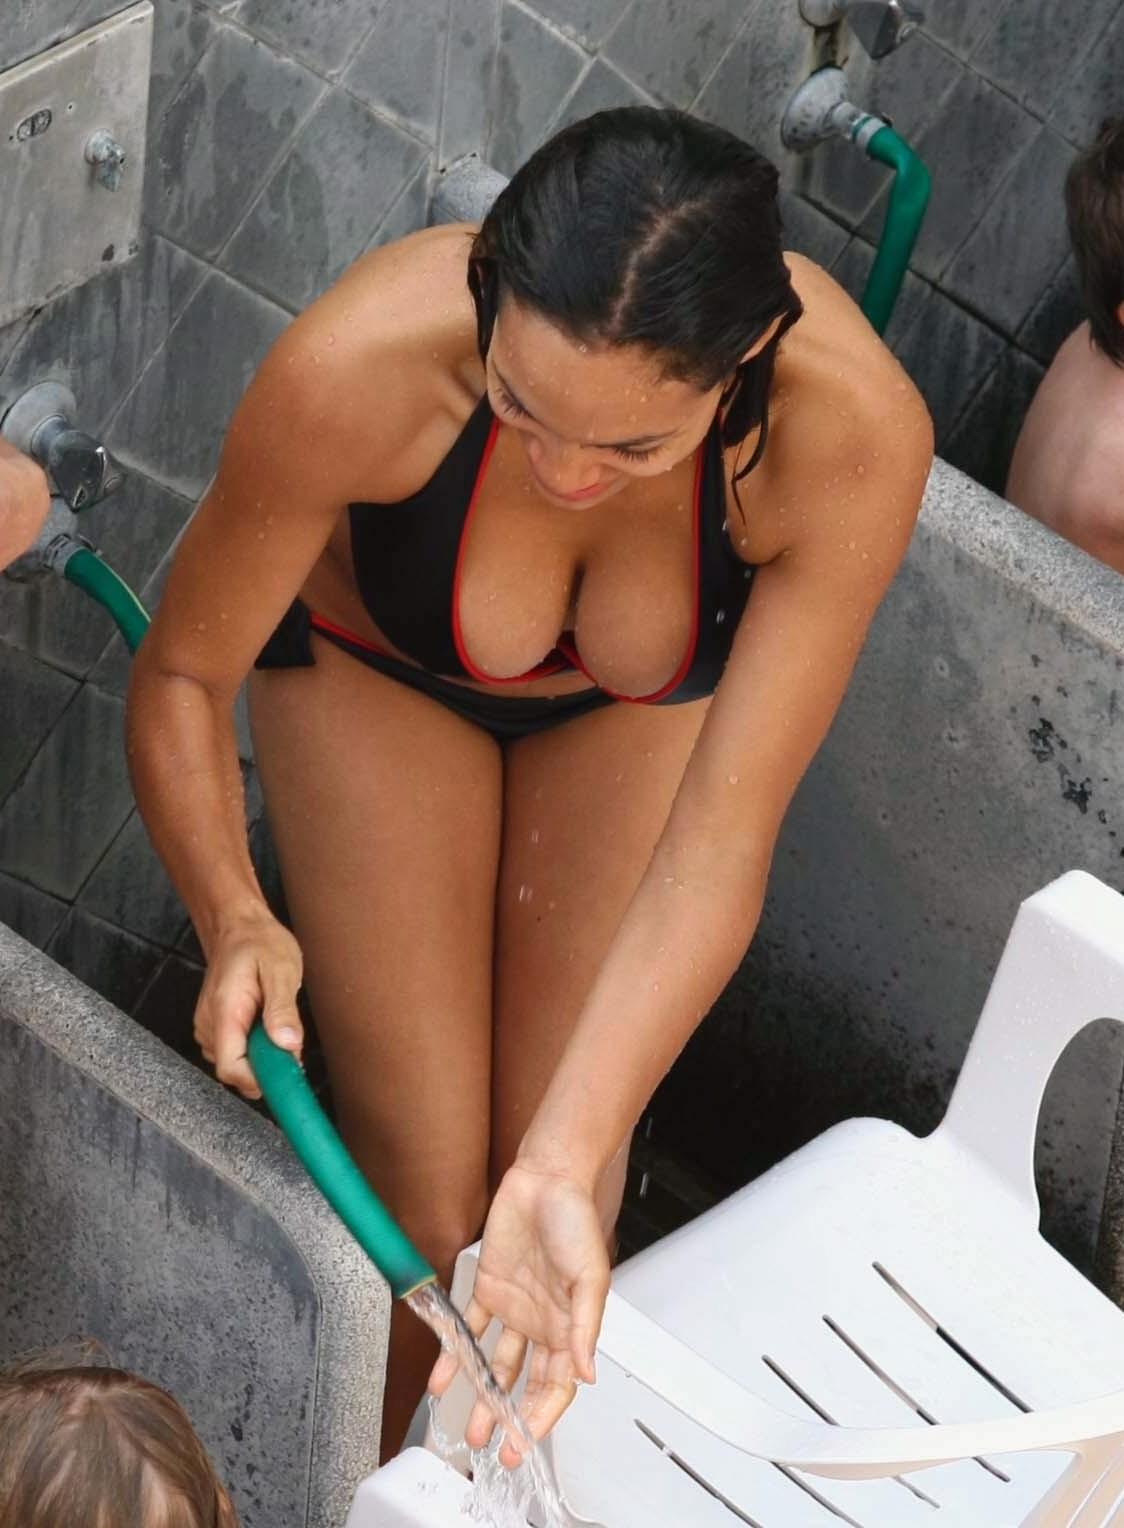 http://2.bp.blogspot.com/-XjL88H_dHvI/TdCh_0fmY-I/AAAAAAAAATY/prCC2a62cgo/s1600/rosario_dawson_rosario_dawson_bikini_1_04_bcdoxIO.jpg